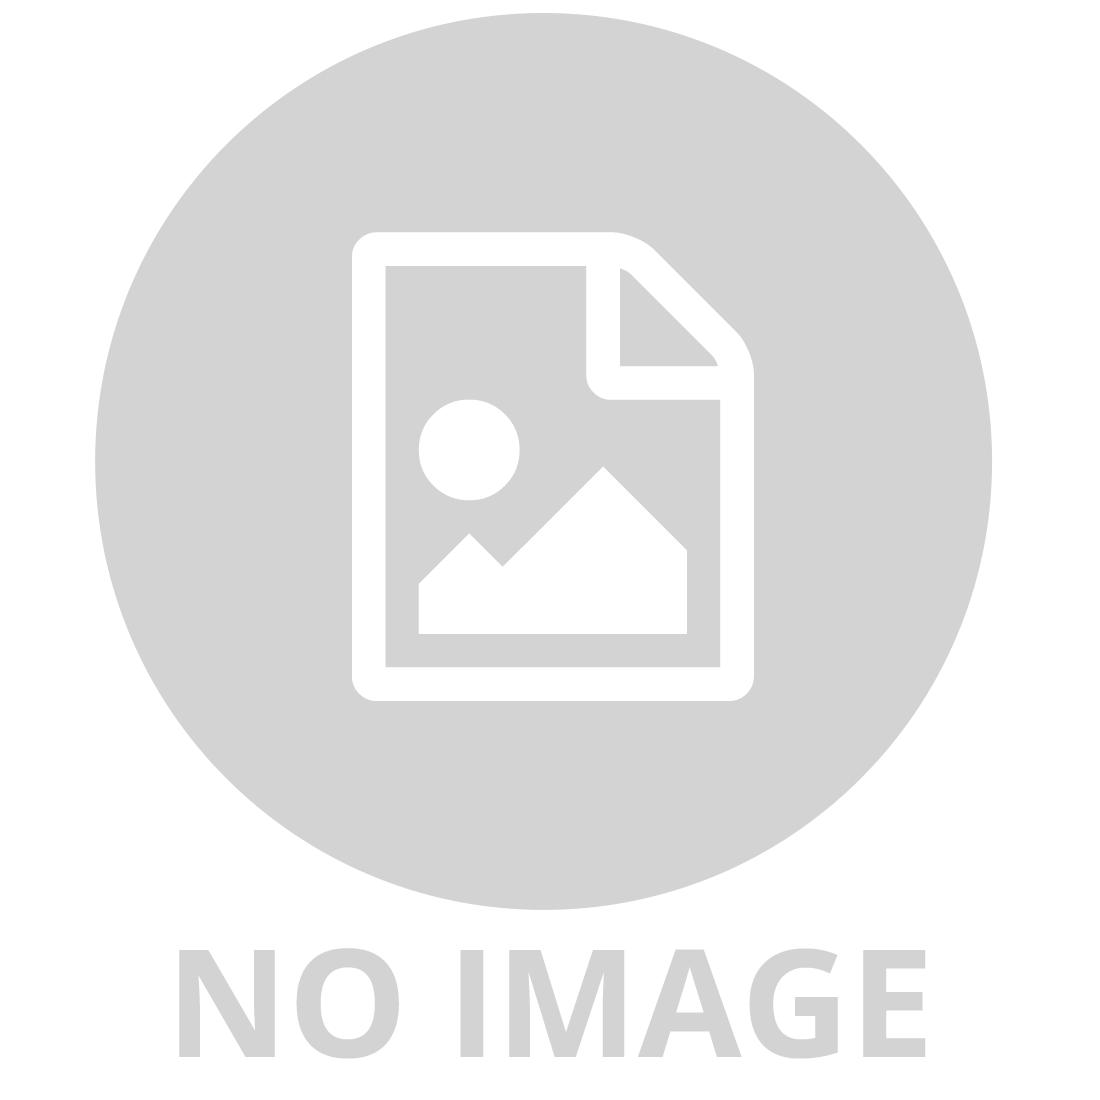 AIRFIX 1/72 BOULTON PAUL DEFIANT MK.1